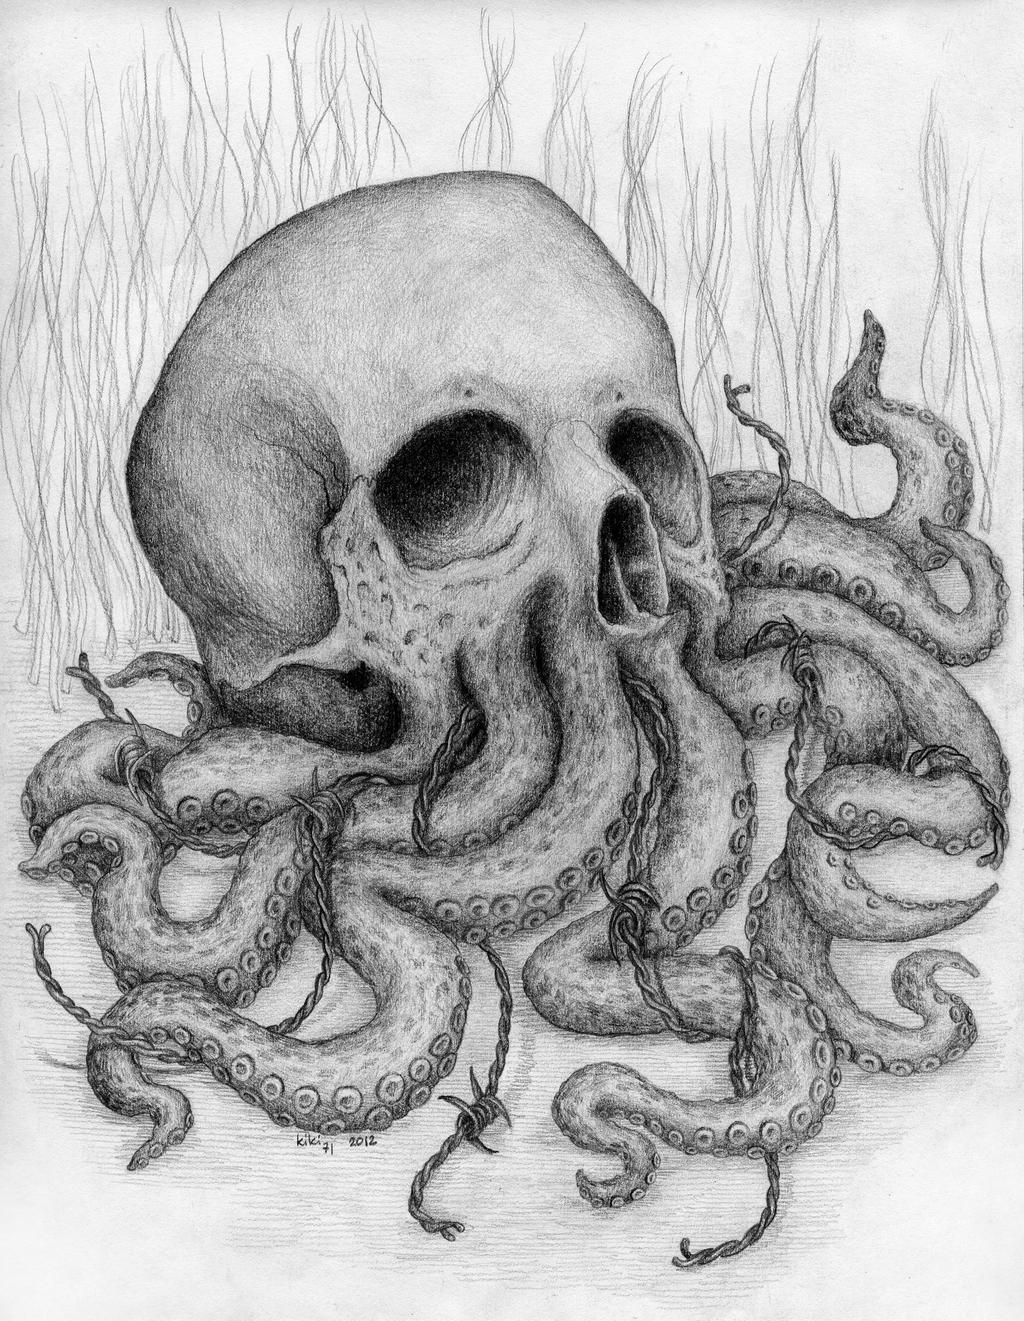 Cthulhu Skull by kiki71